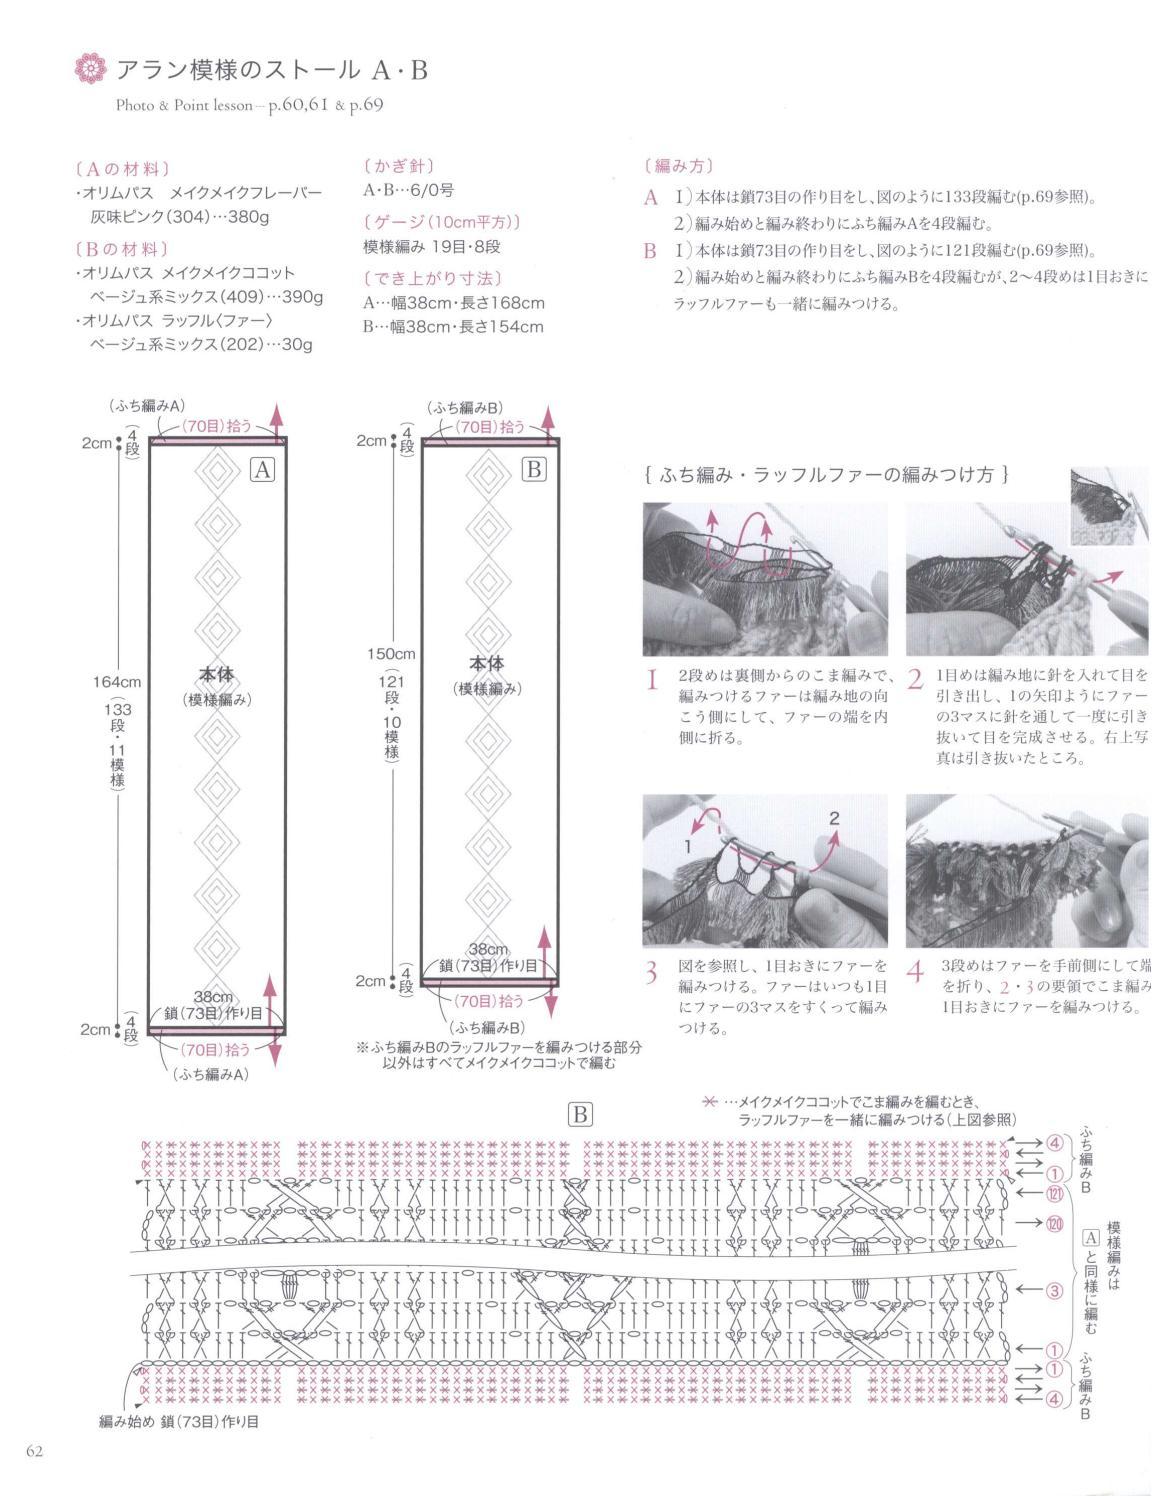 Asahi original crochet best selection 2012 page 62